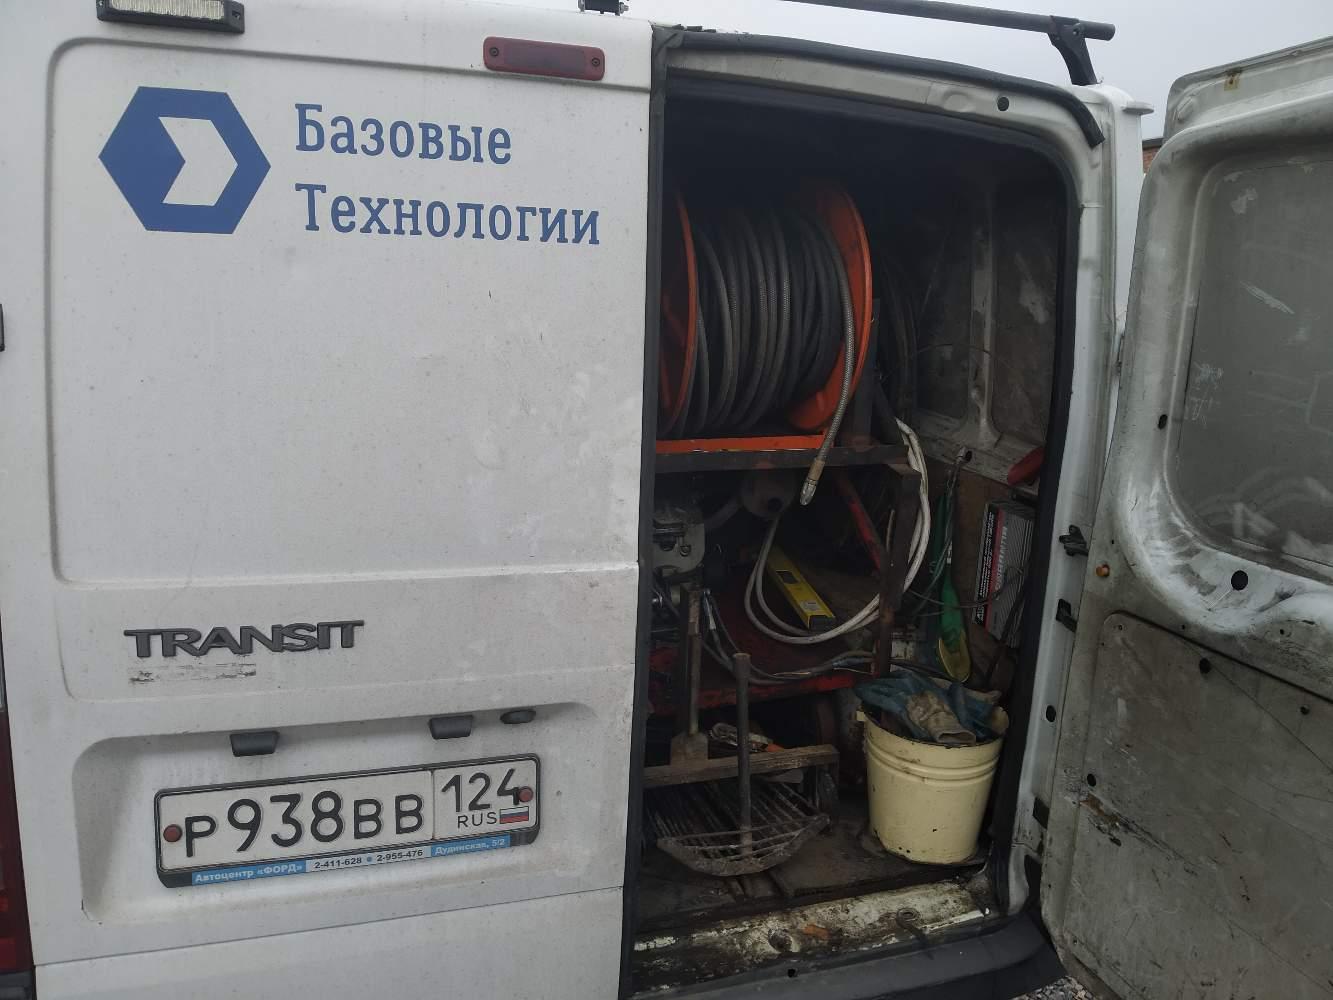 Прочистка канализационных труб #5300